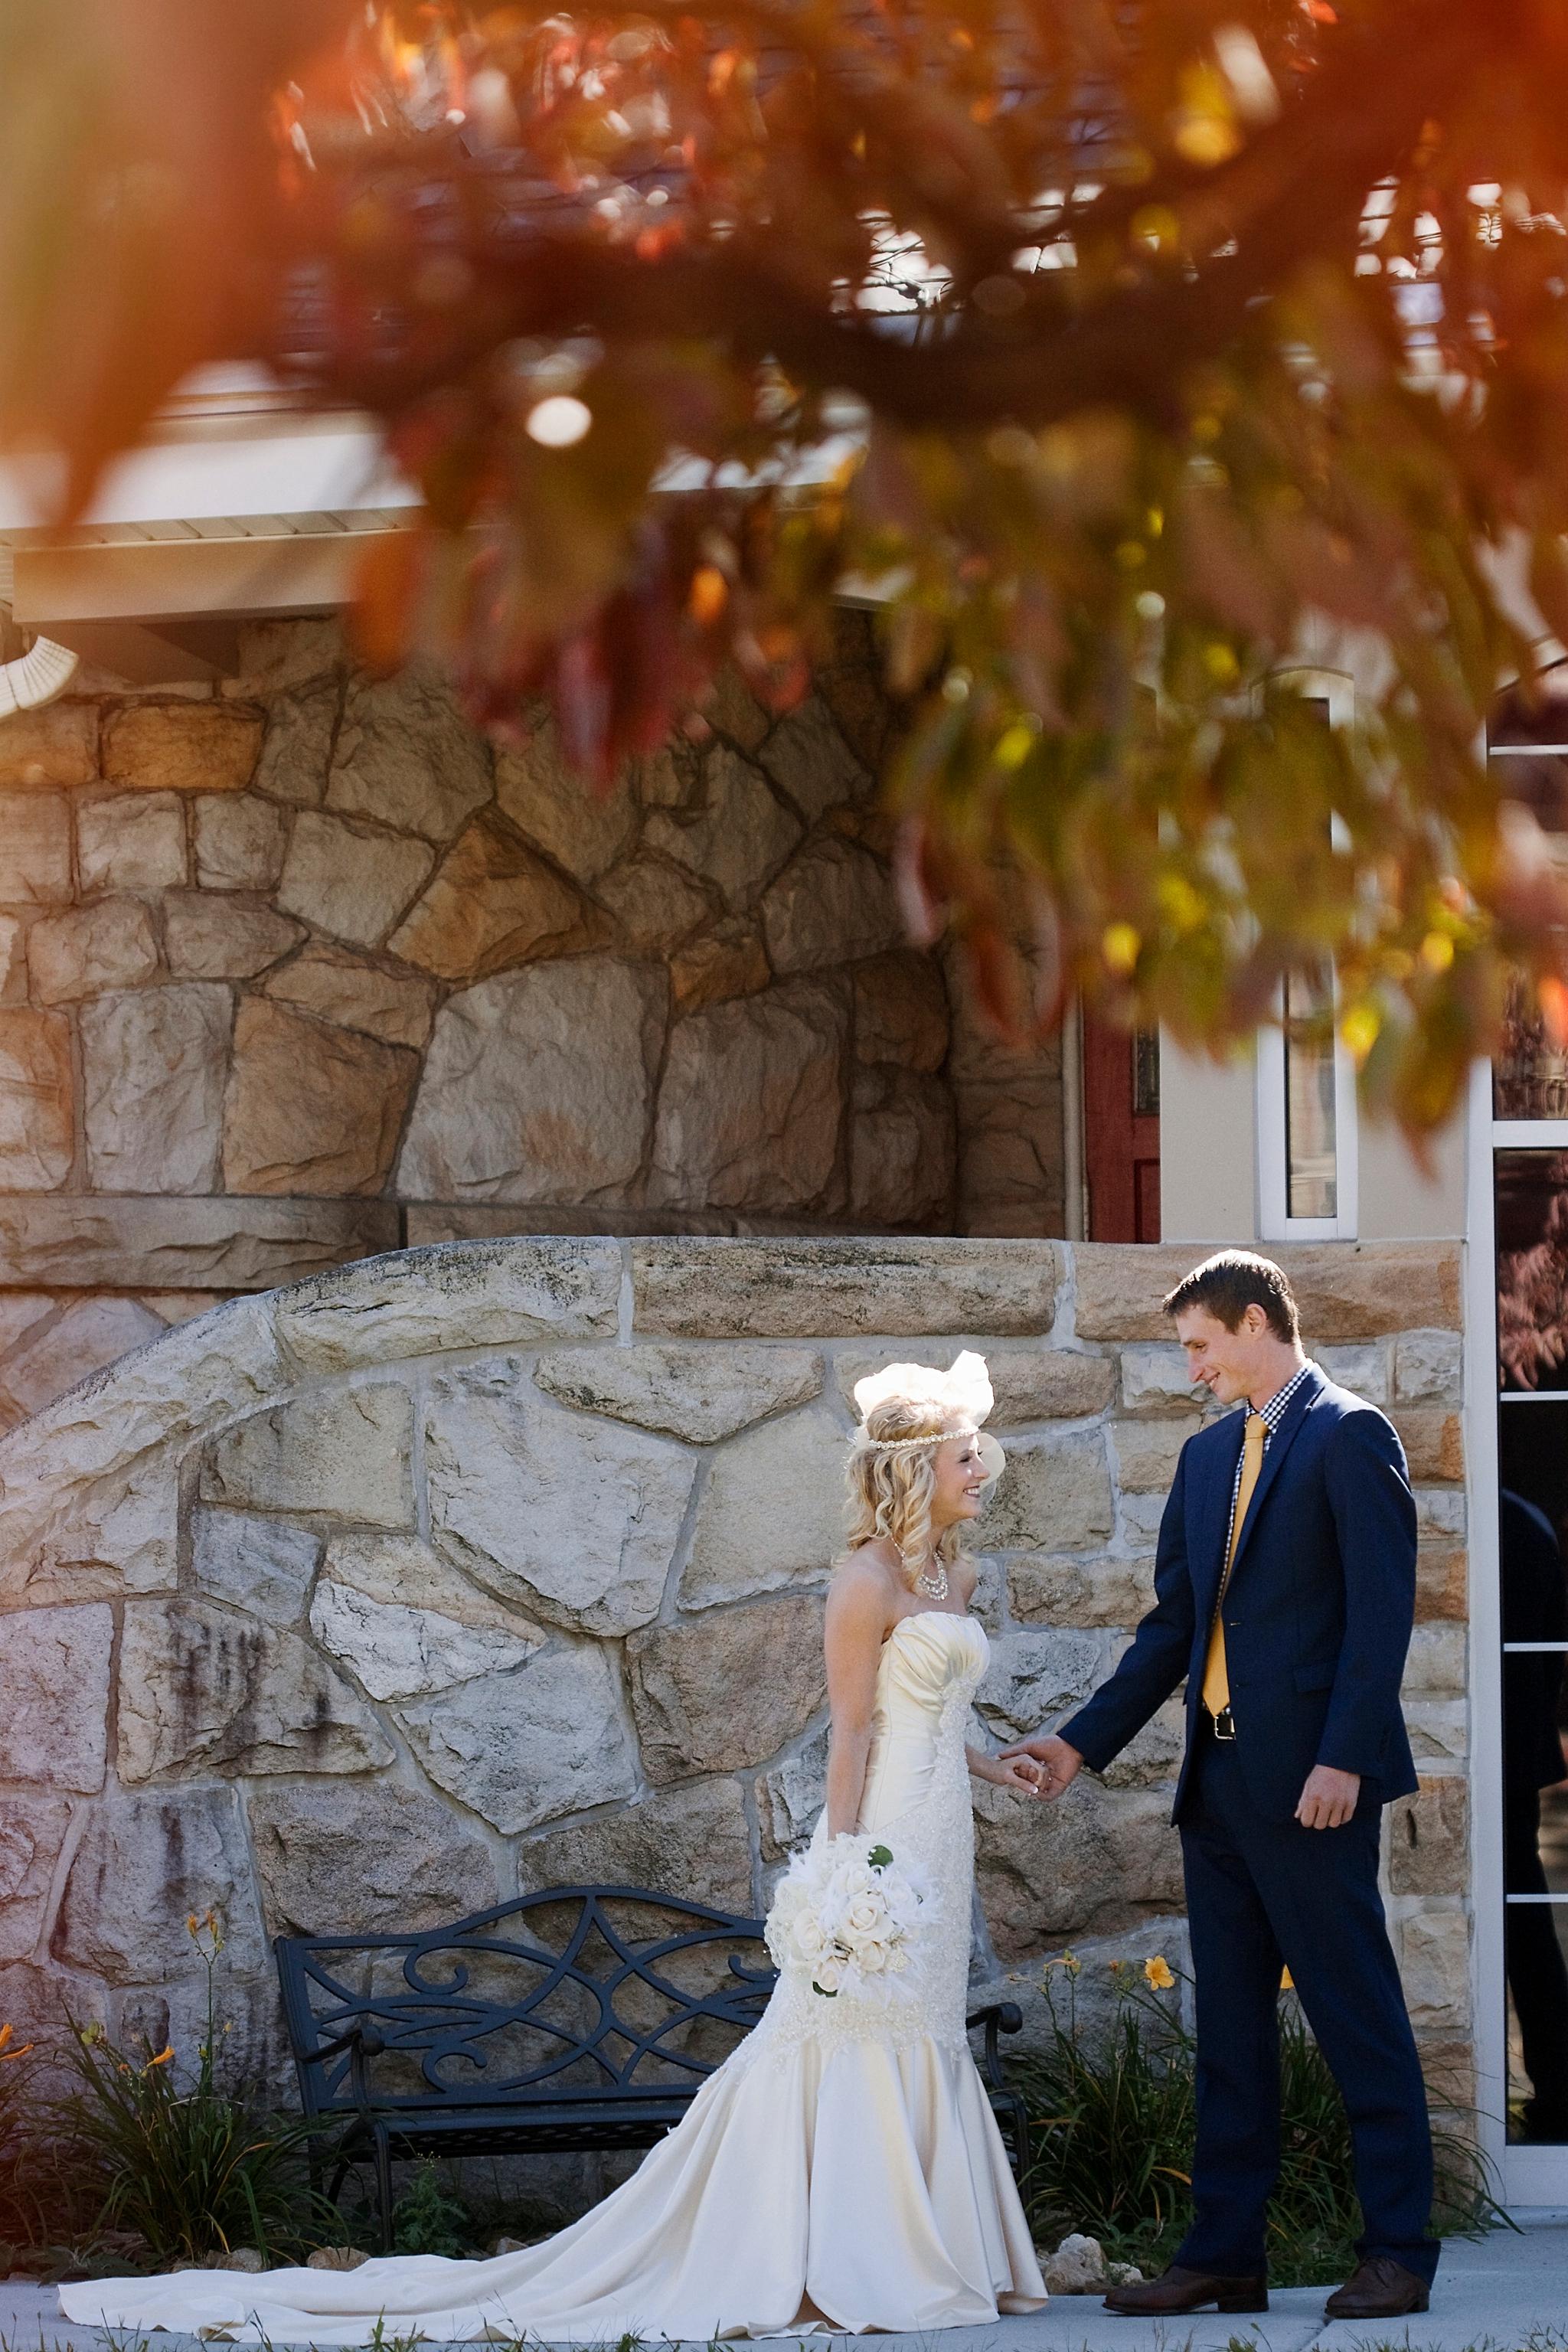 1Sherris Wedding Seniors 2015 Joelle Watt Studios1_13.jpg